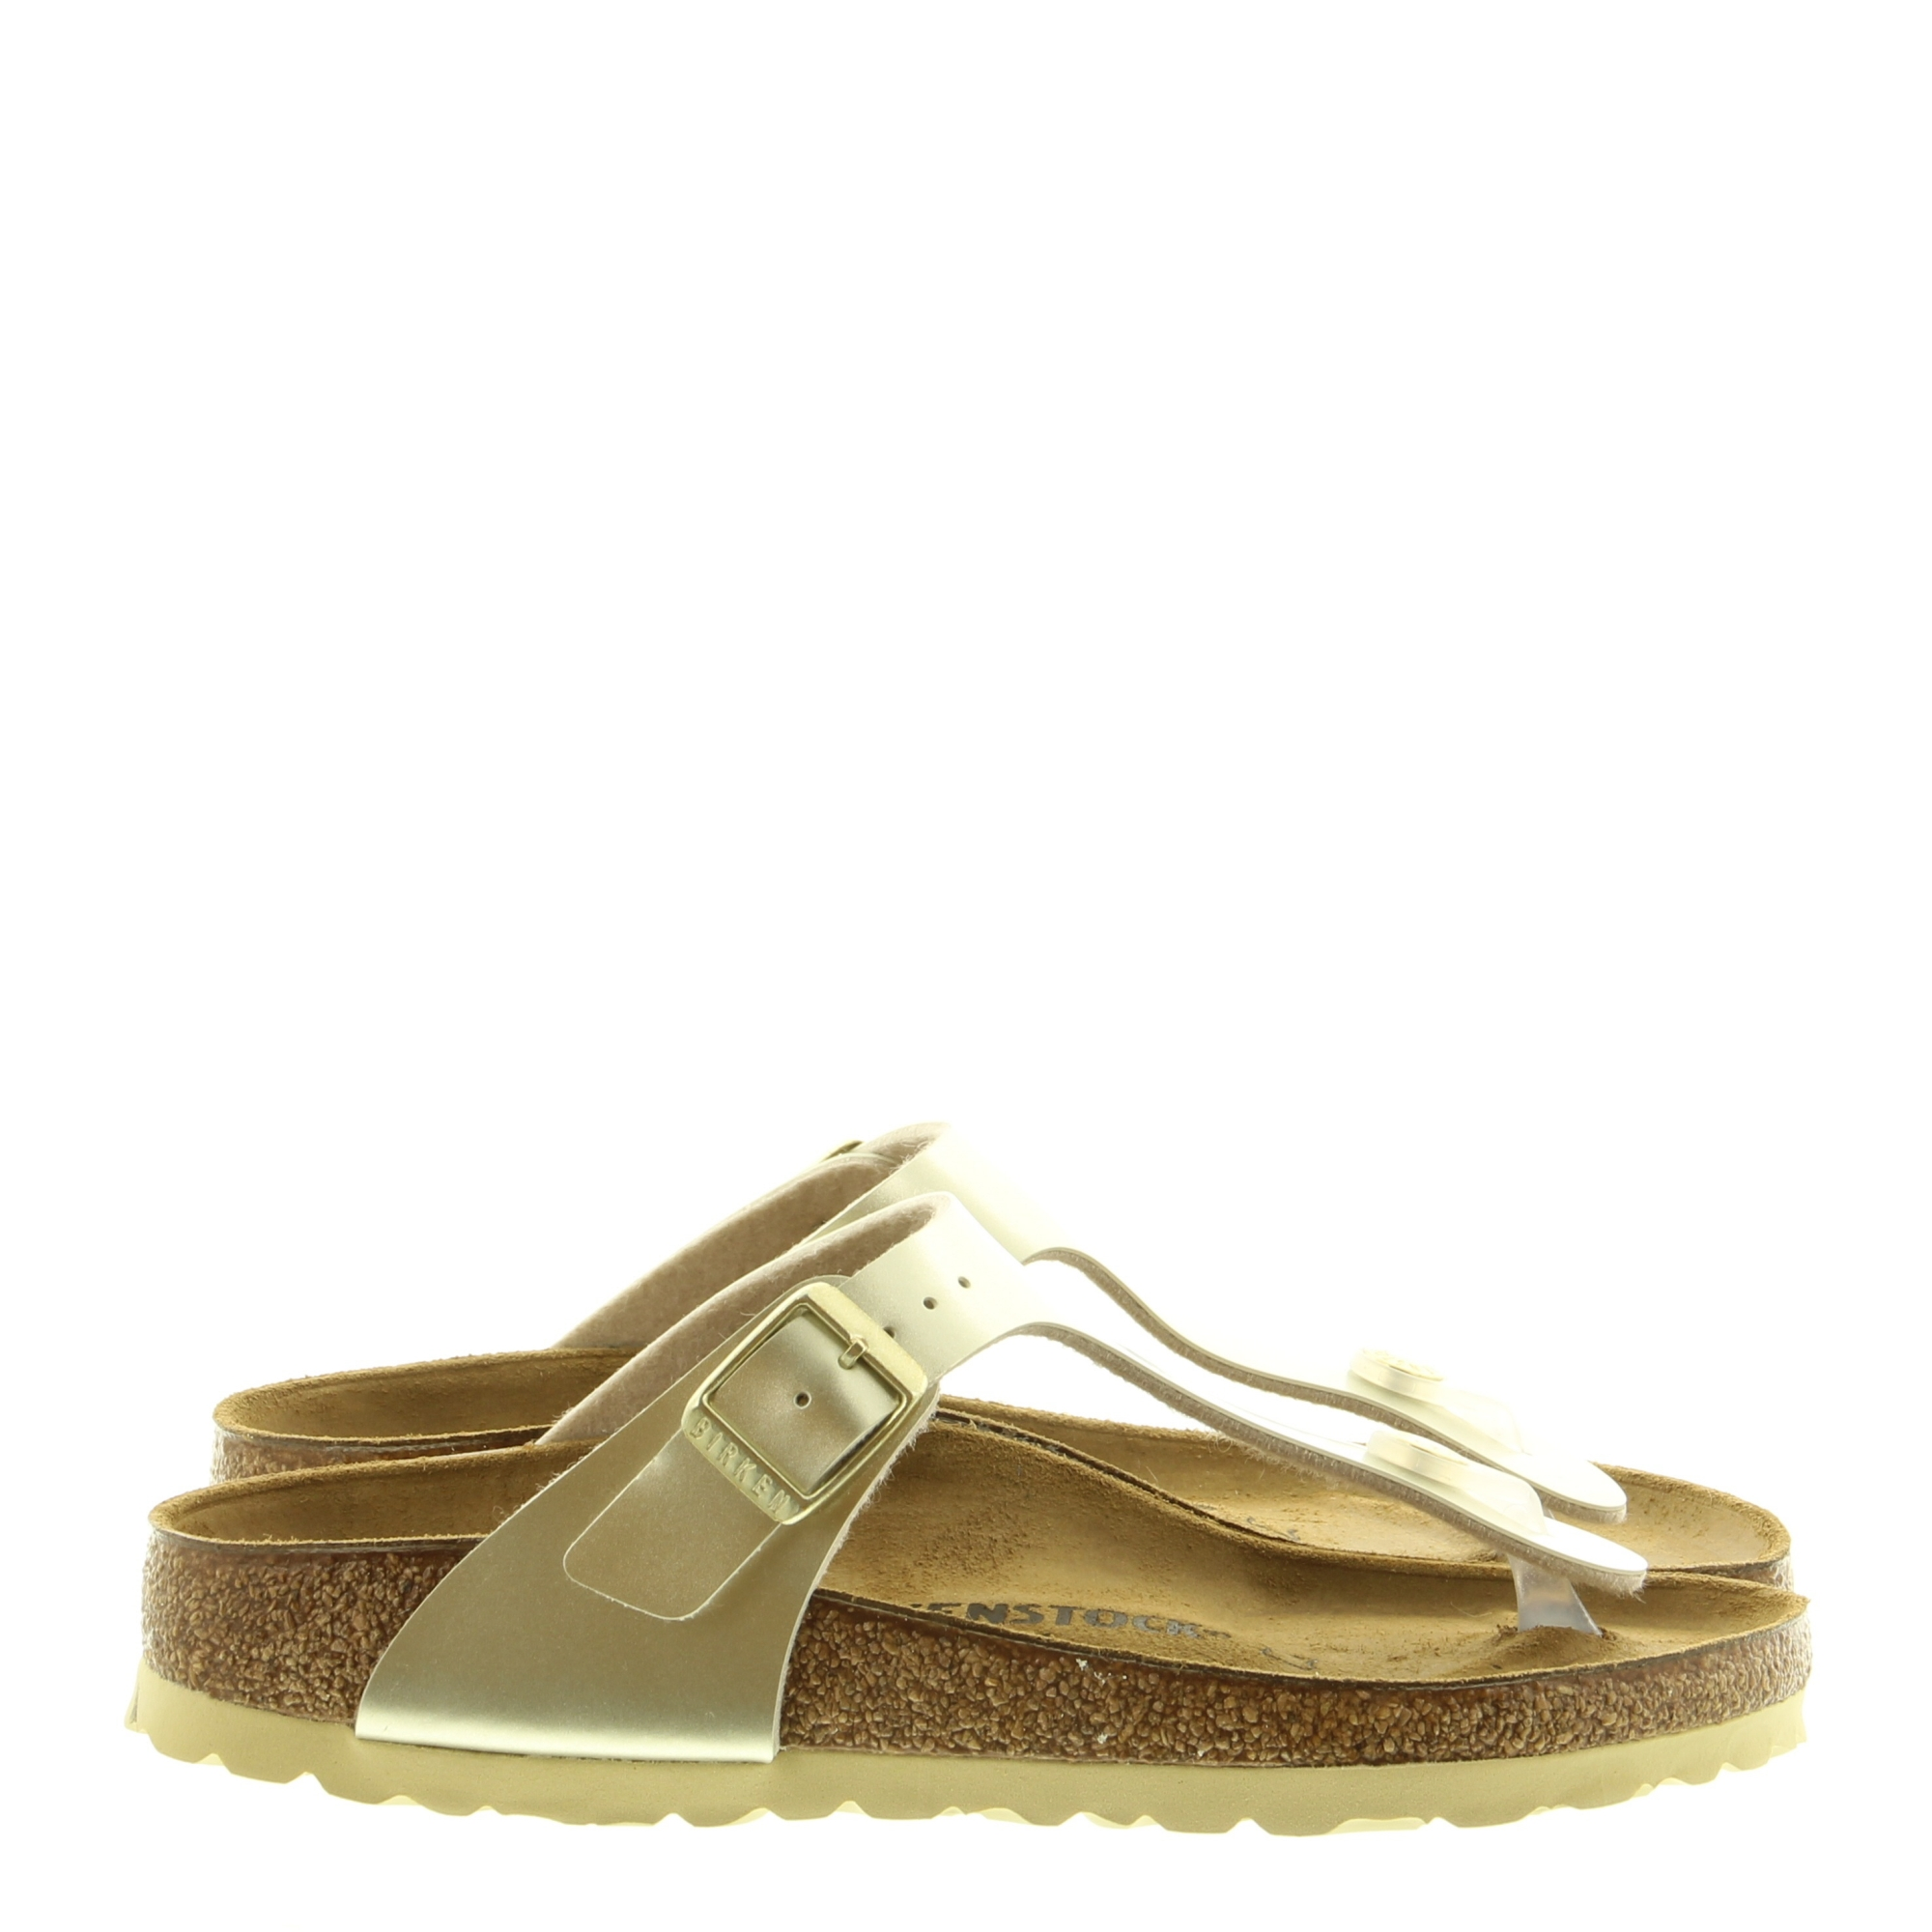 Birkenstock 1015593 Gizeh Electric Metallic Gold